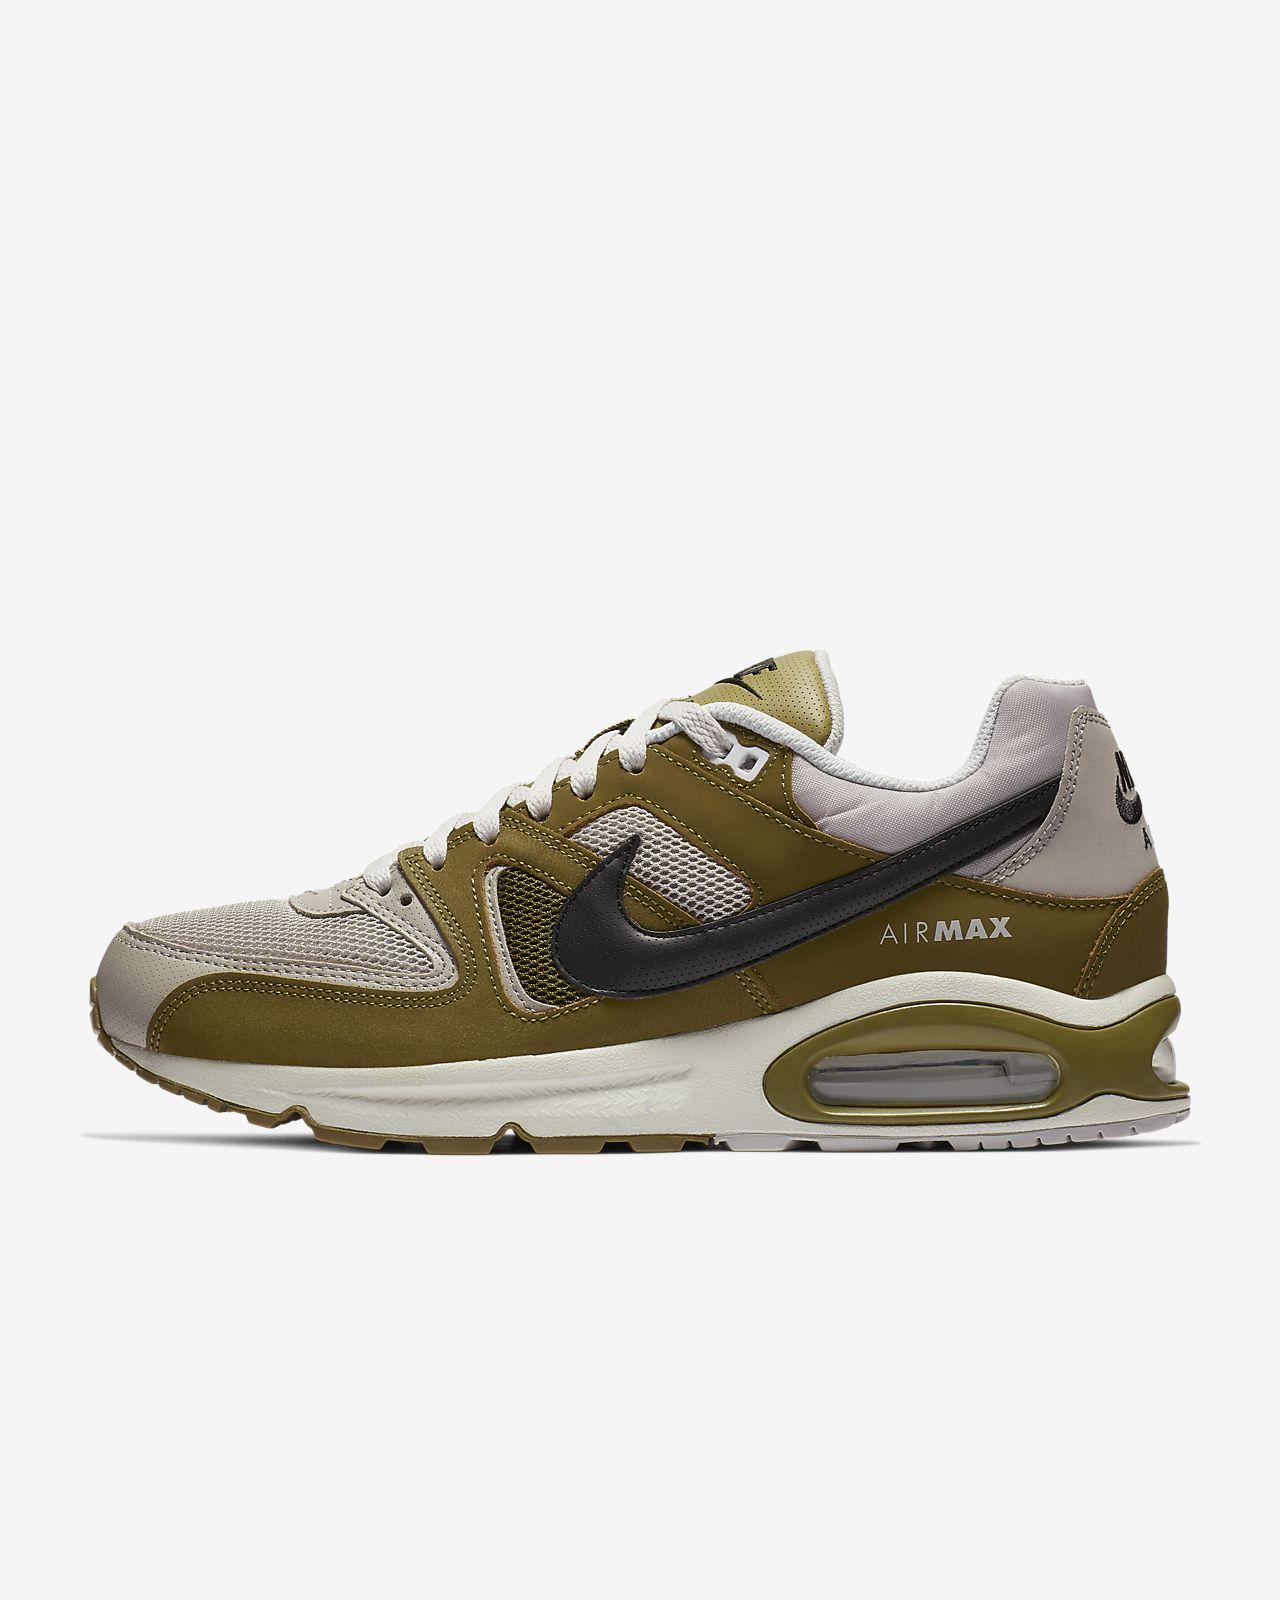 Men's Command ShoeGb Air Nike Max ARLc53jq4